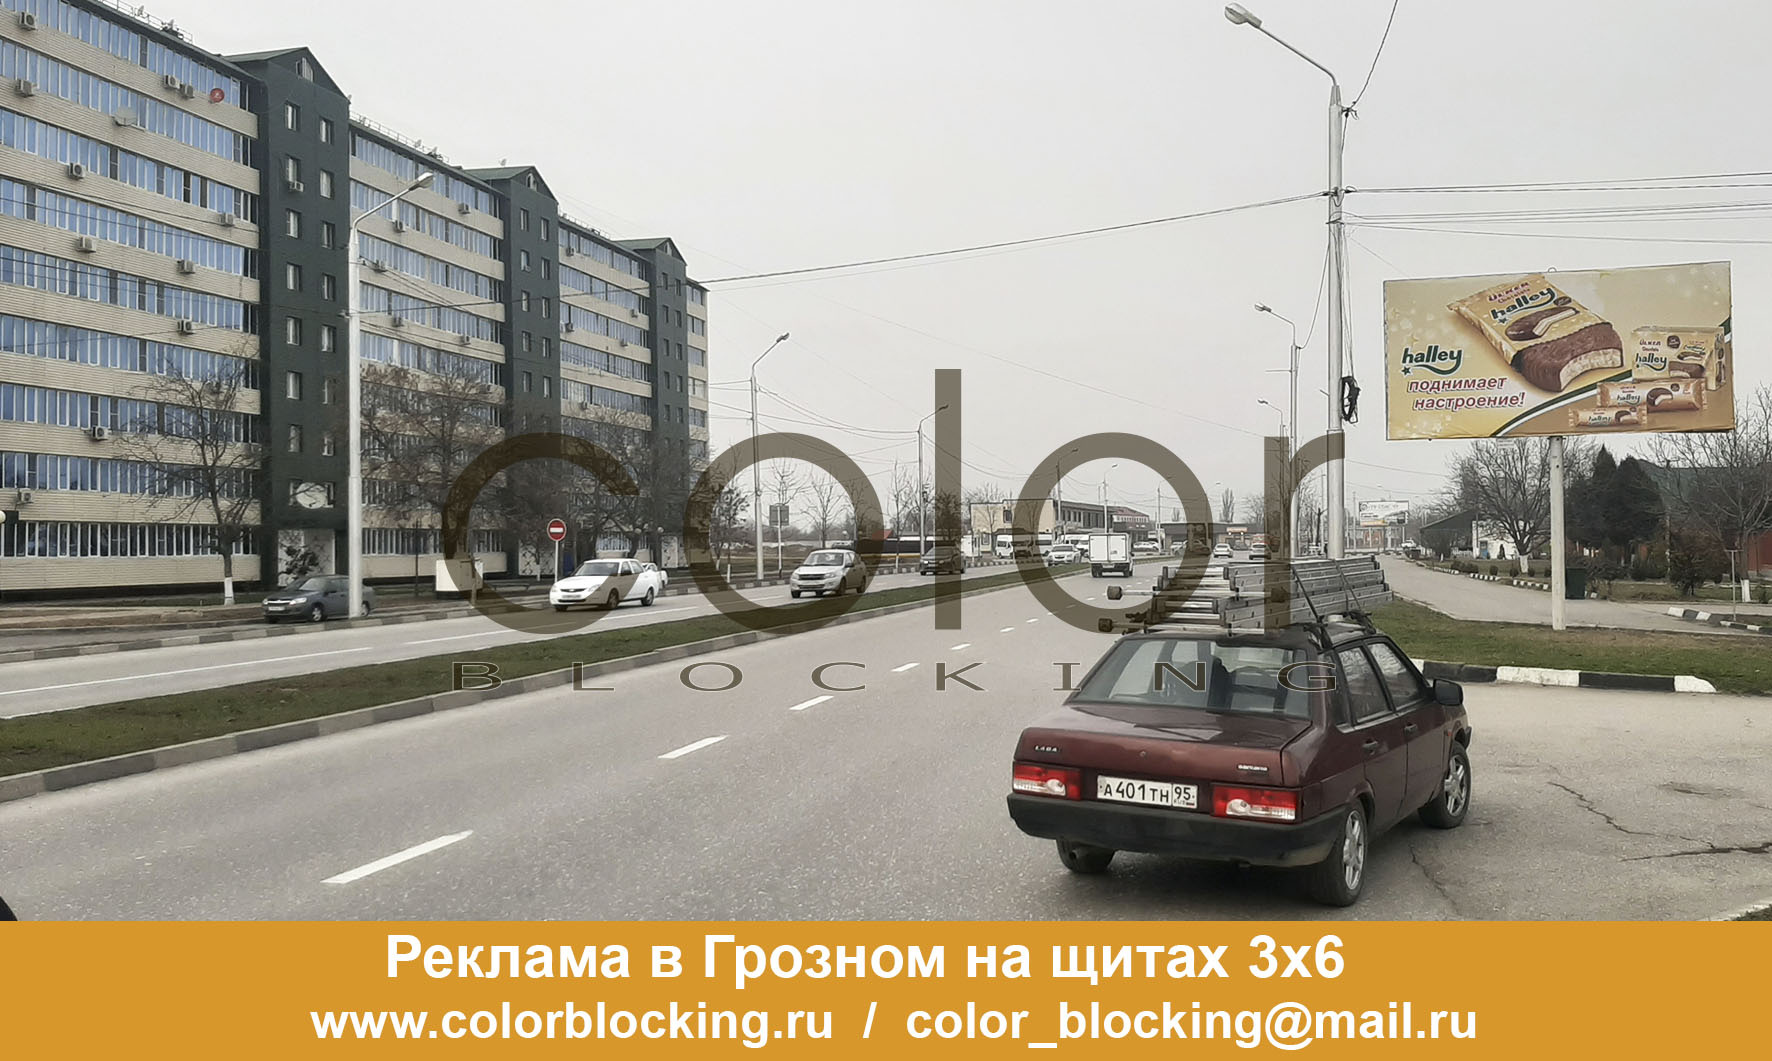 Реклама в Грозном на щитах 3х6 аренда